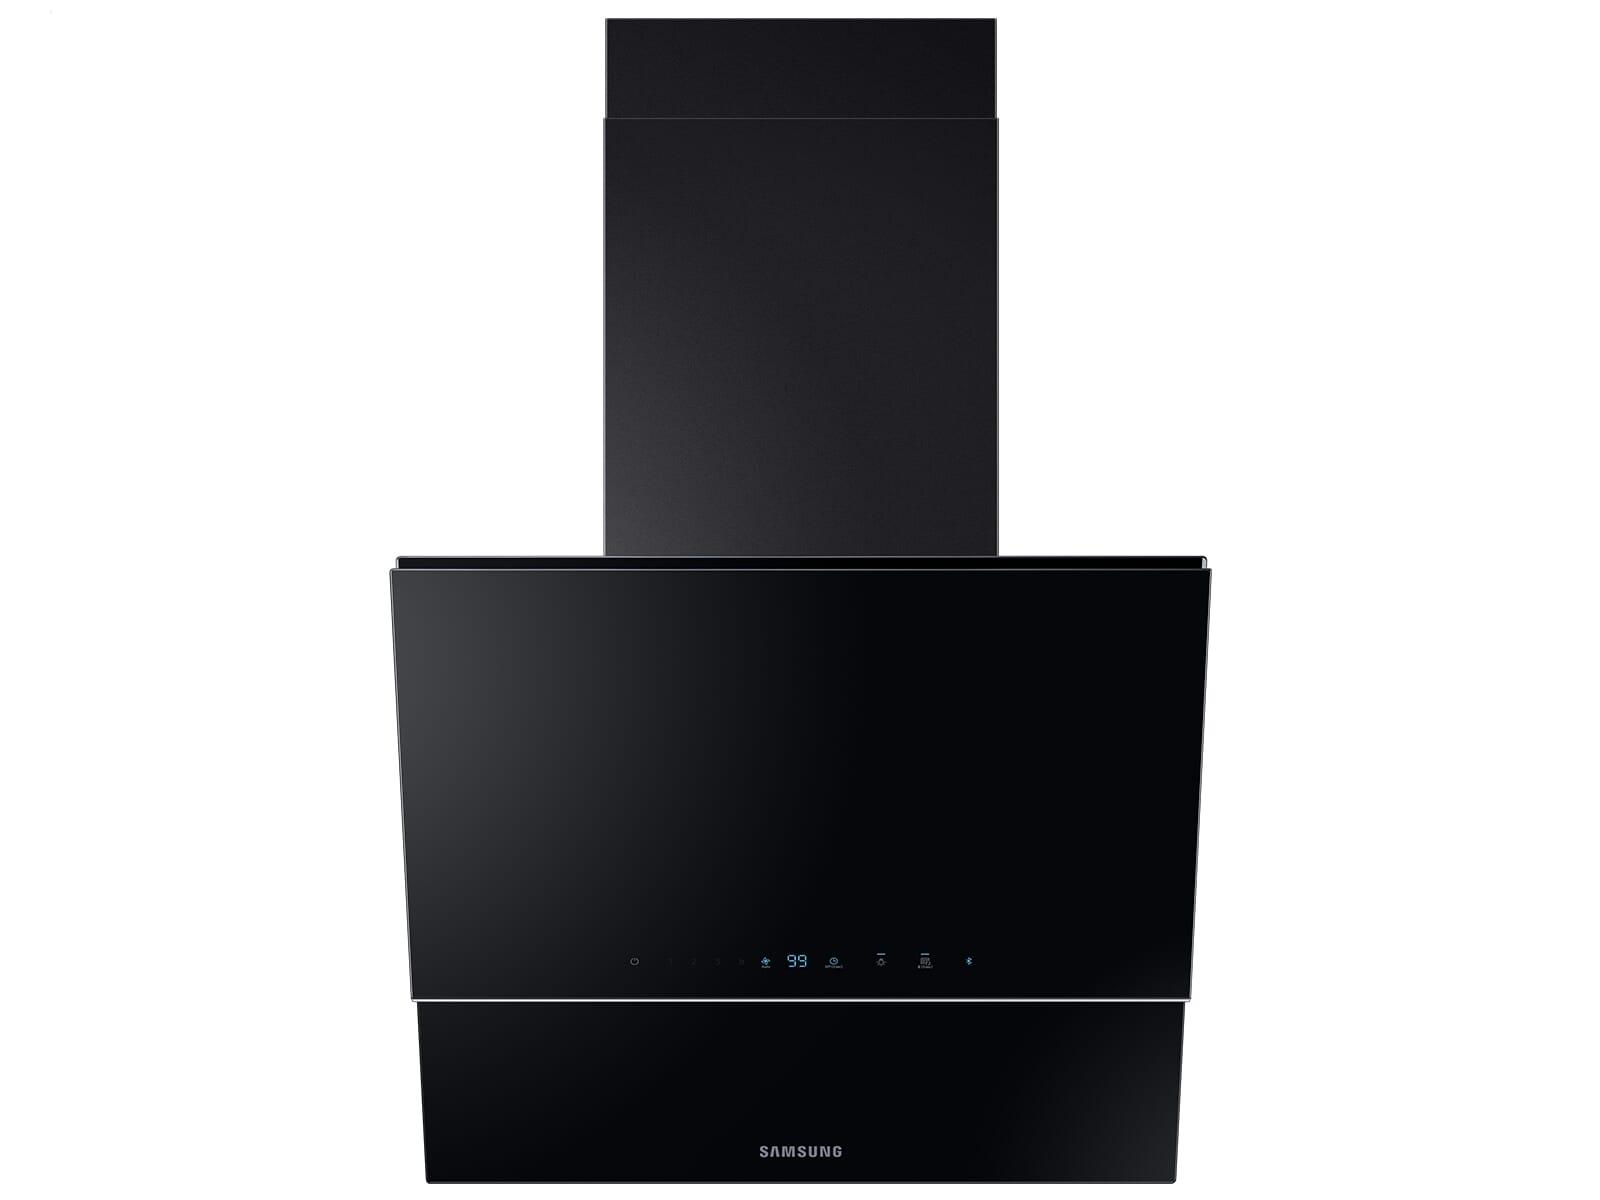 Samsung NK24N9804VB/UR Kopffreihaube 60 cm Schwarz